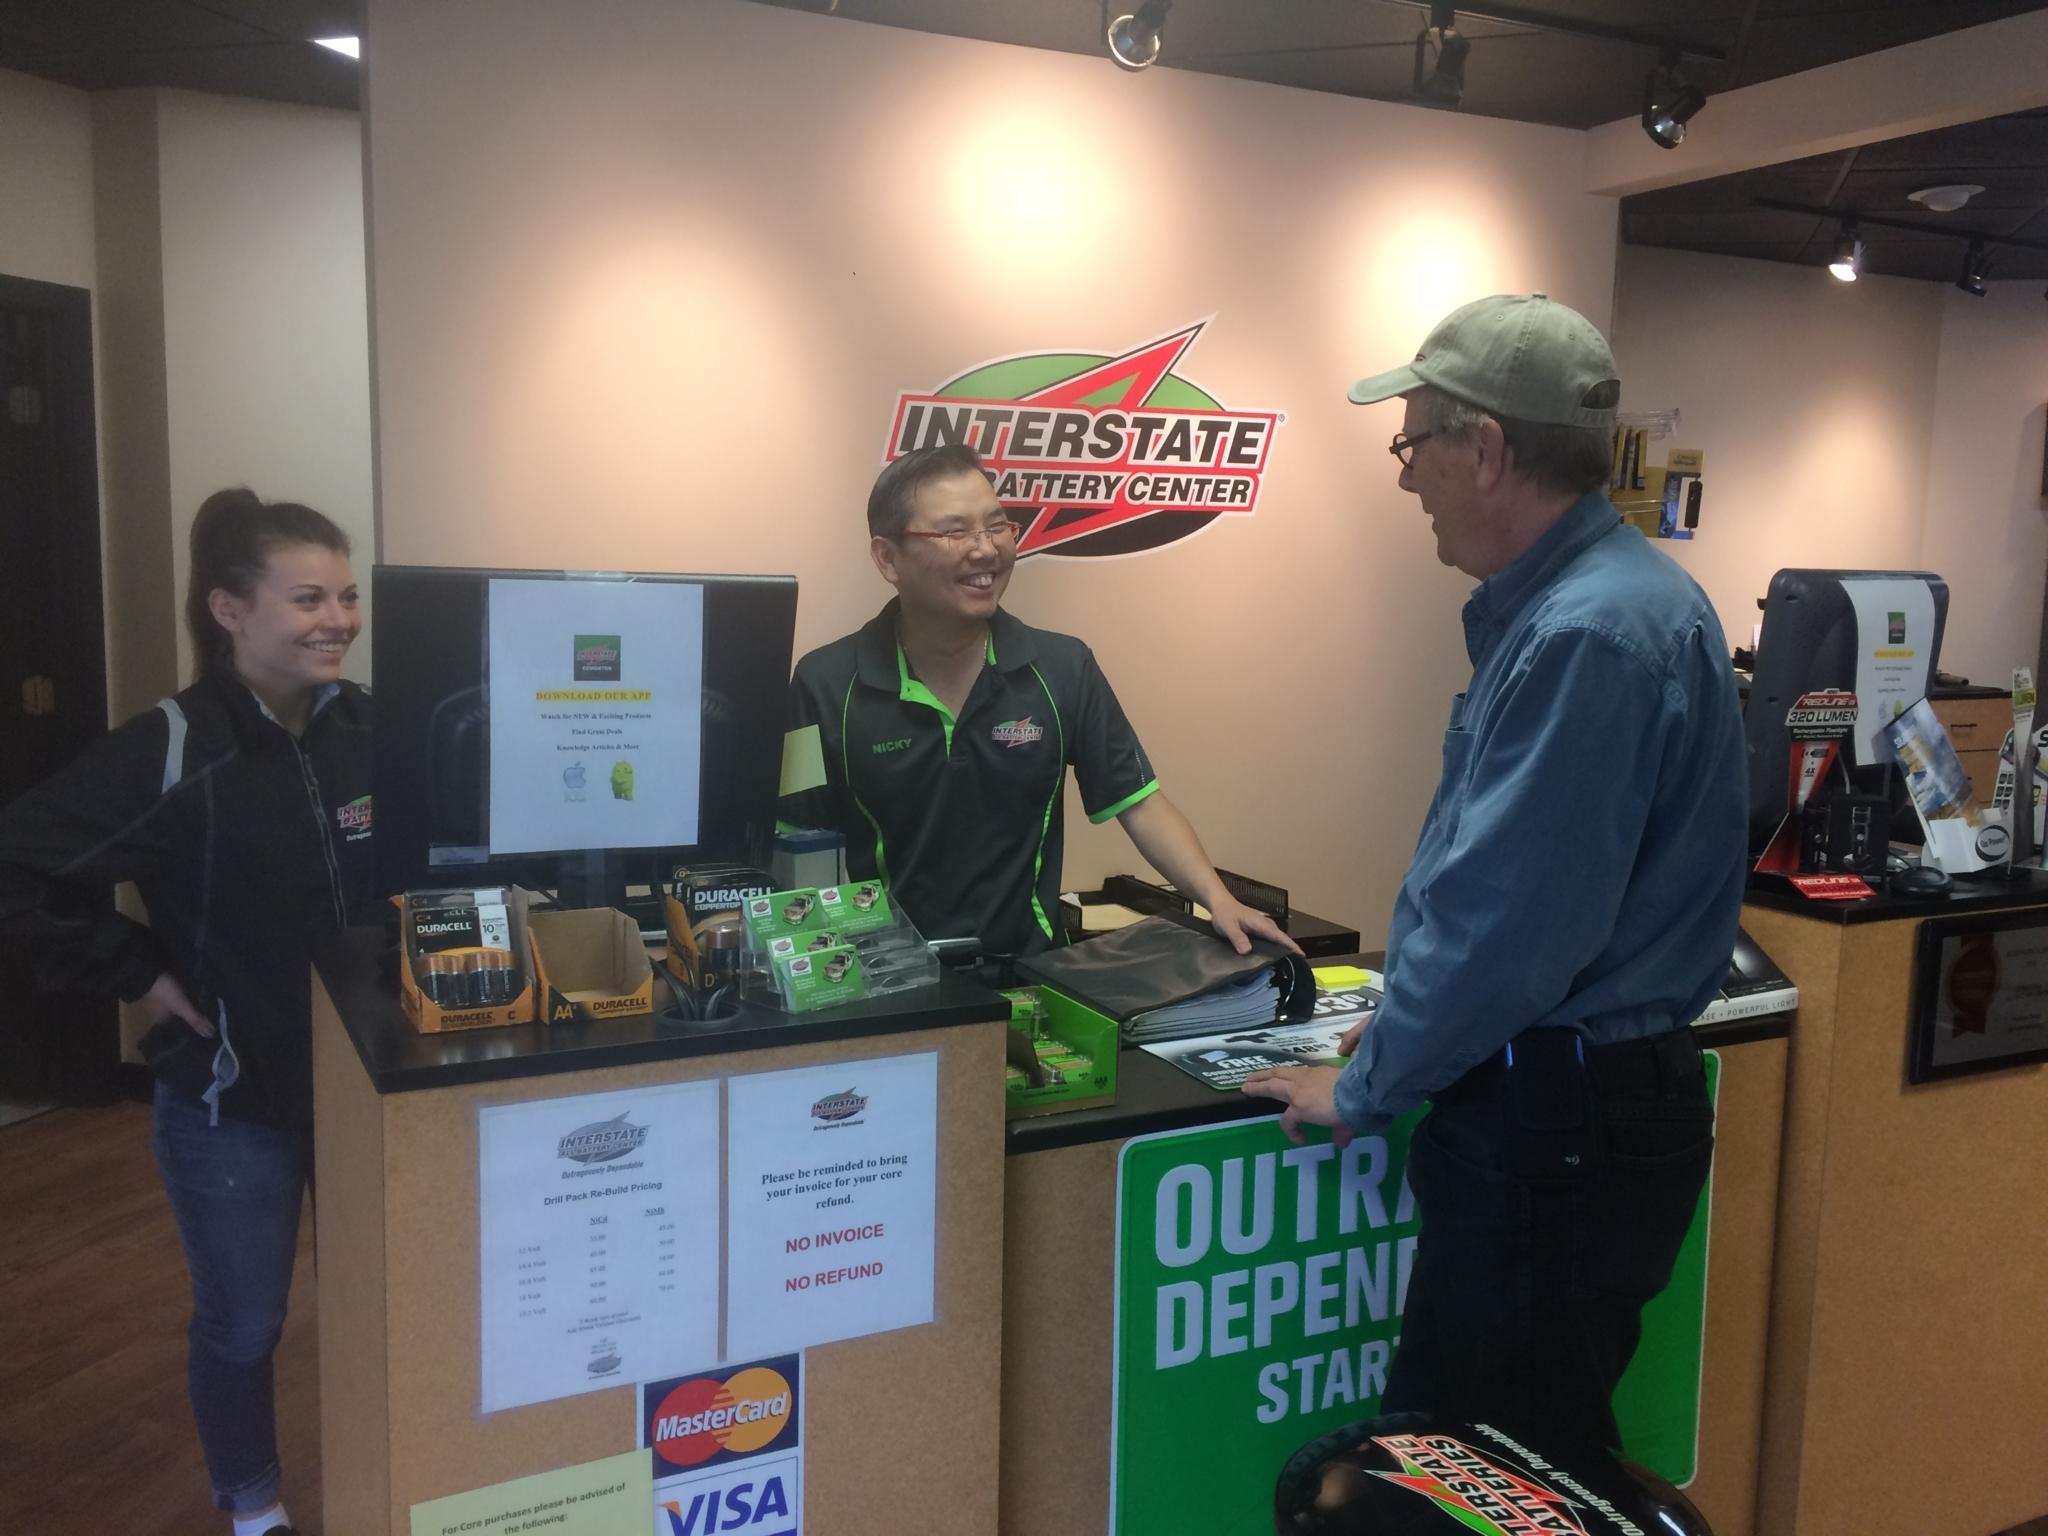 Interstate Batteries Front Counter Interstate Batteries Edmonton (780)454-4343